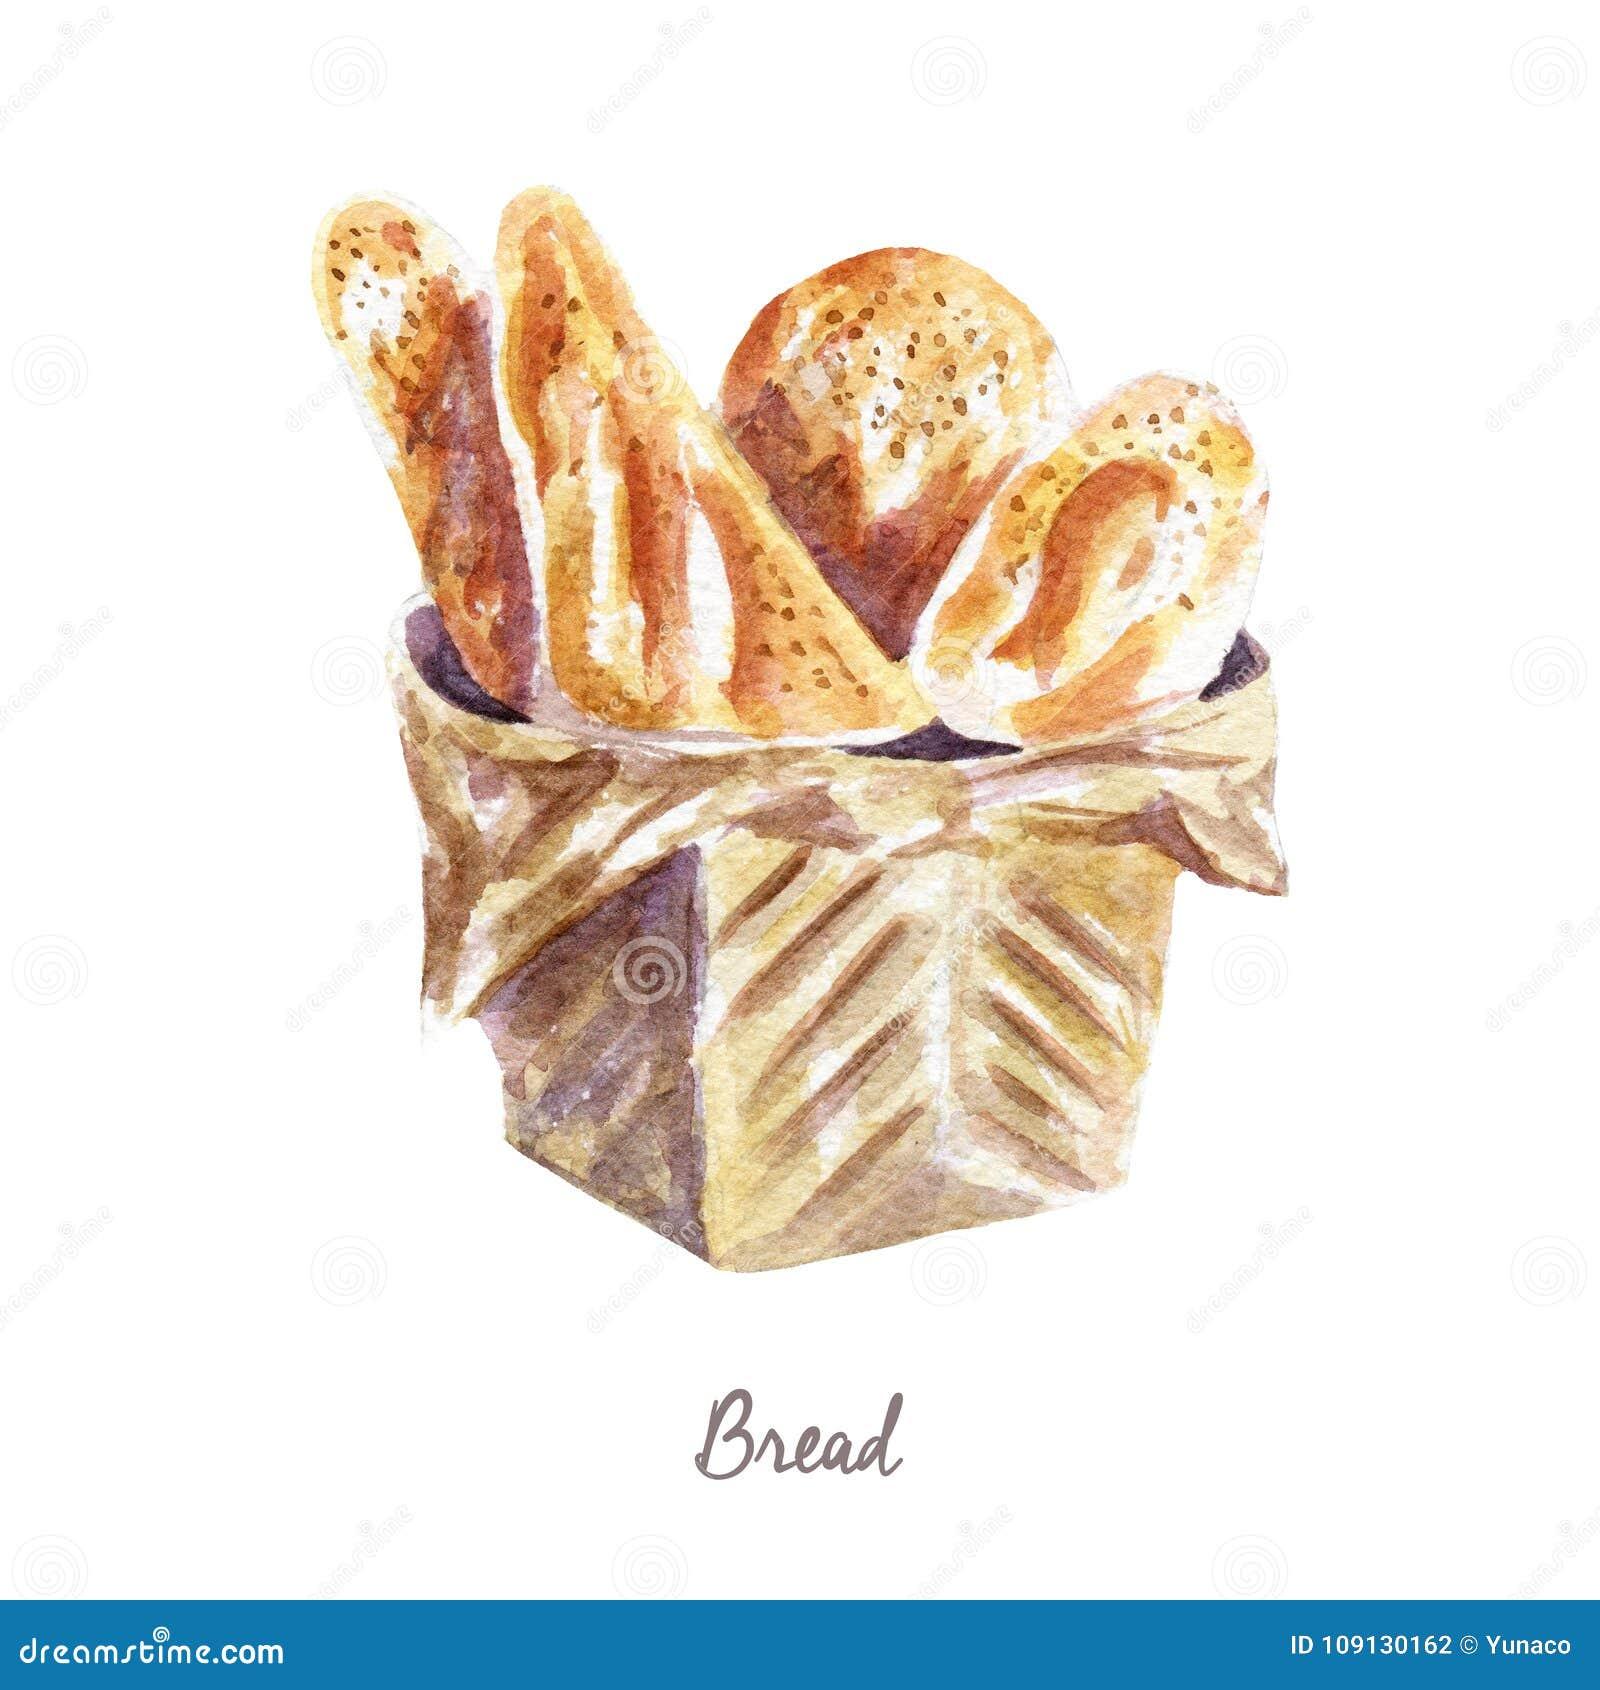 Watercolor Bread Stock Illustrations 4 631 Watercolor Bread Stock Illustrations Vectors Clipart Dreamstime